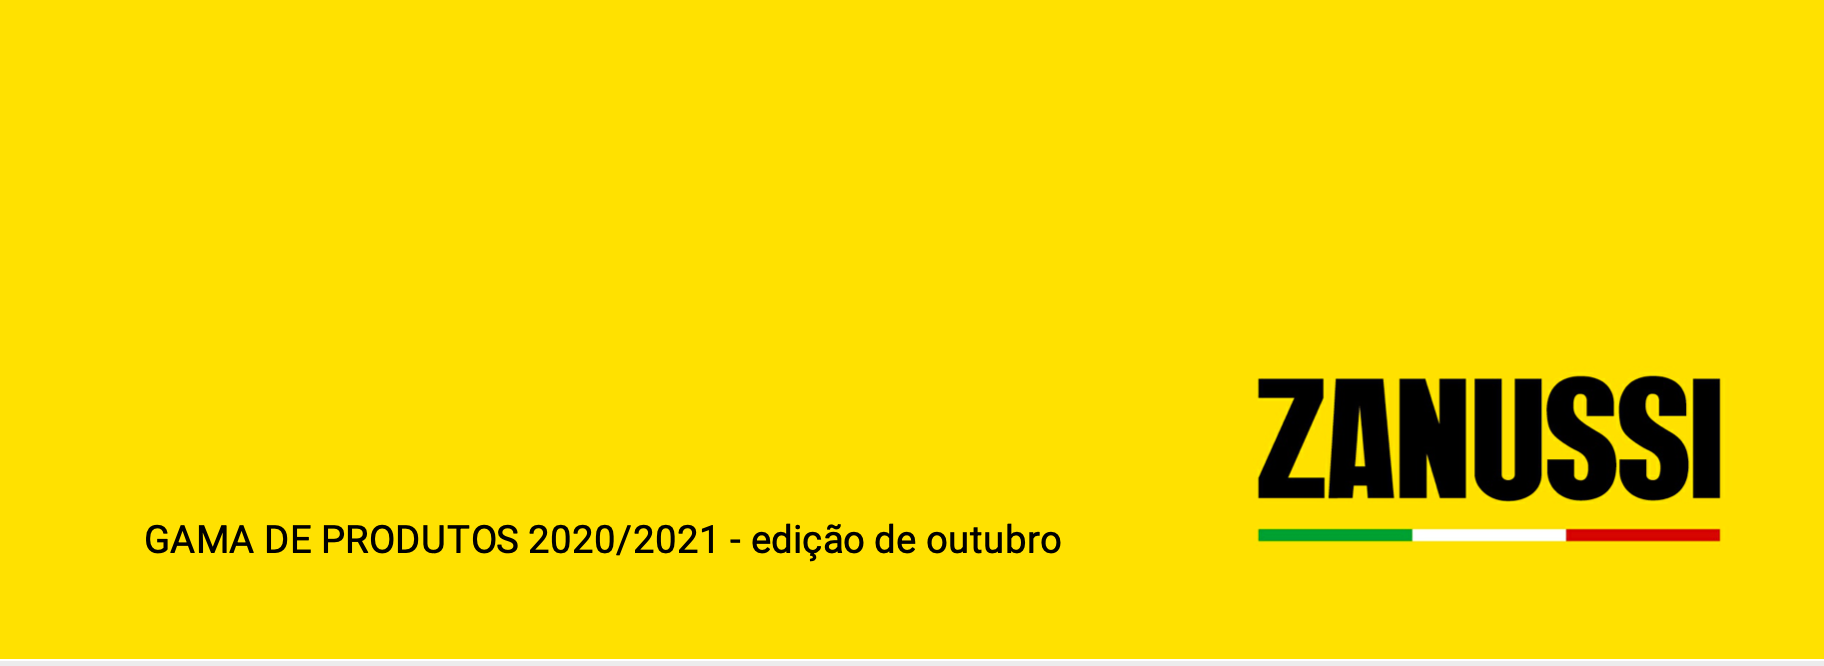 Catálogo Zanussi